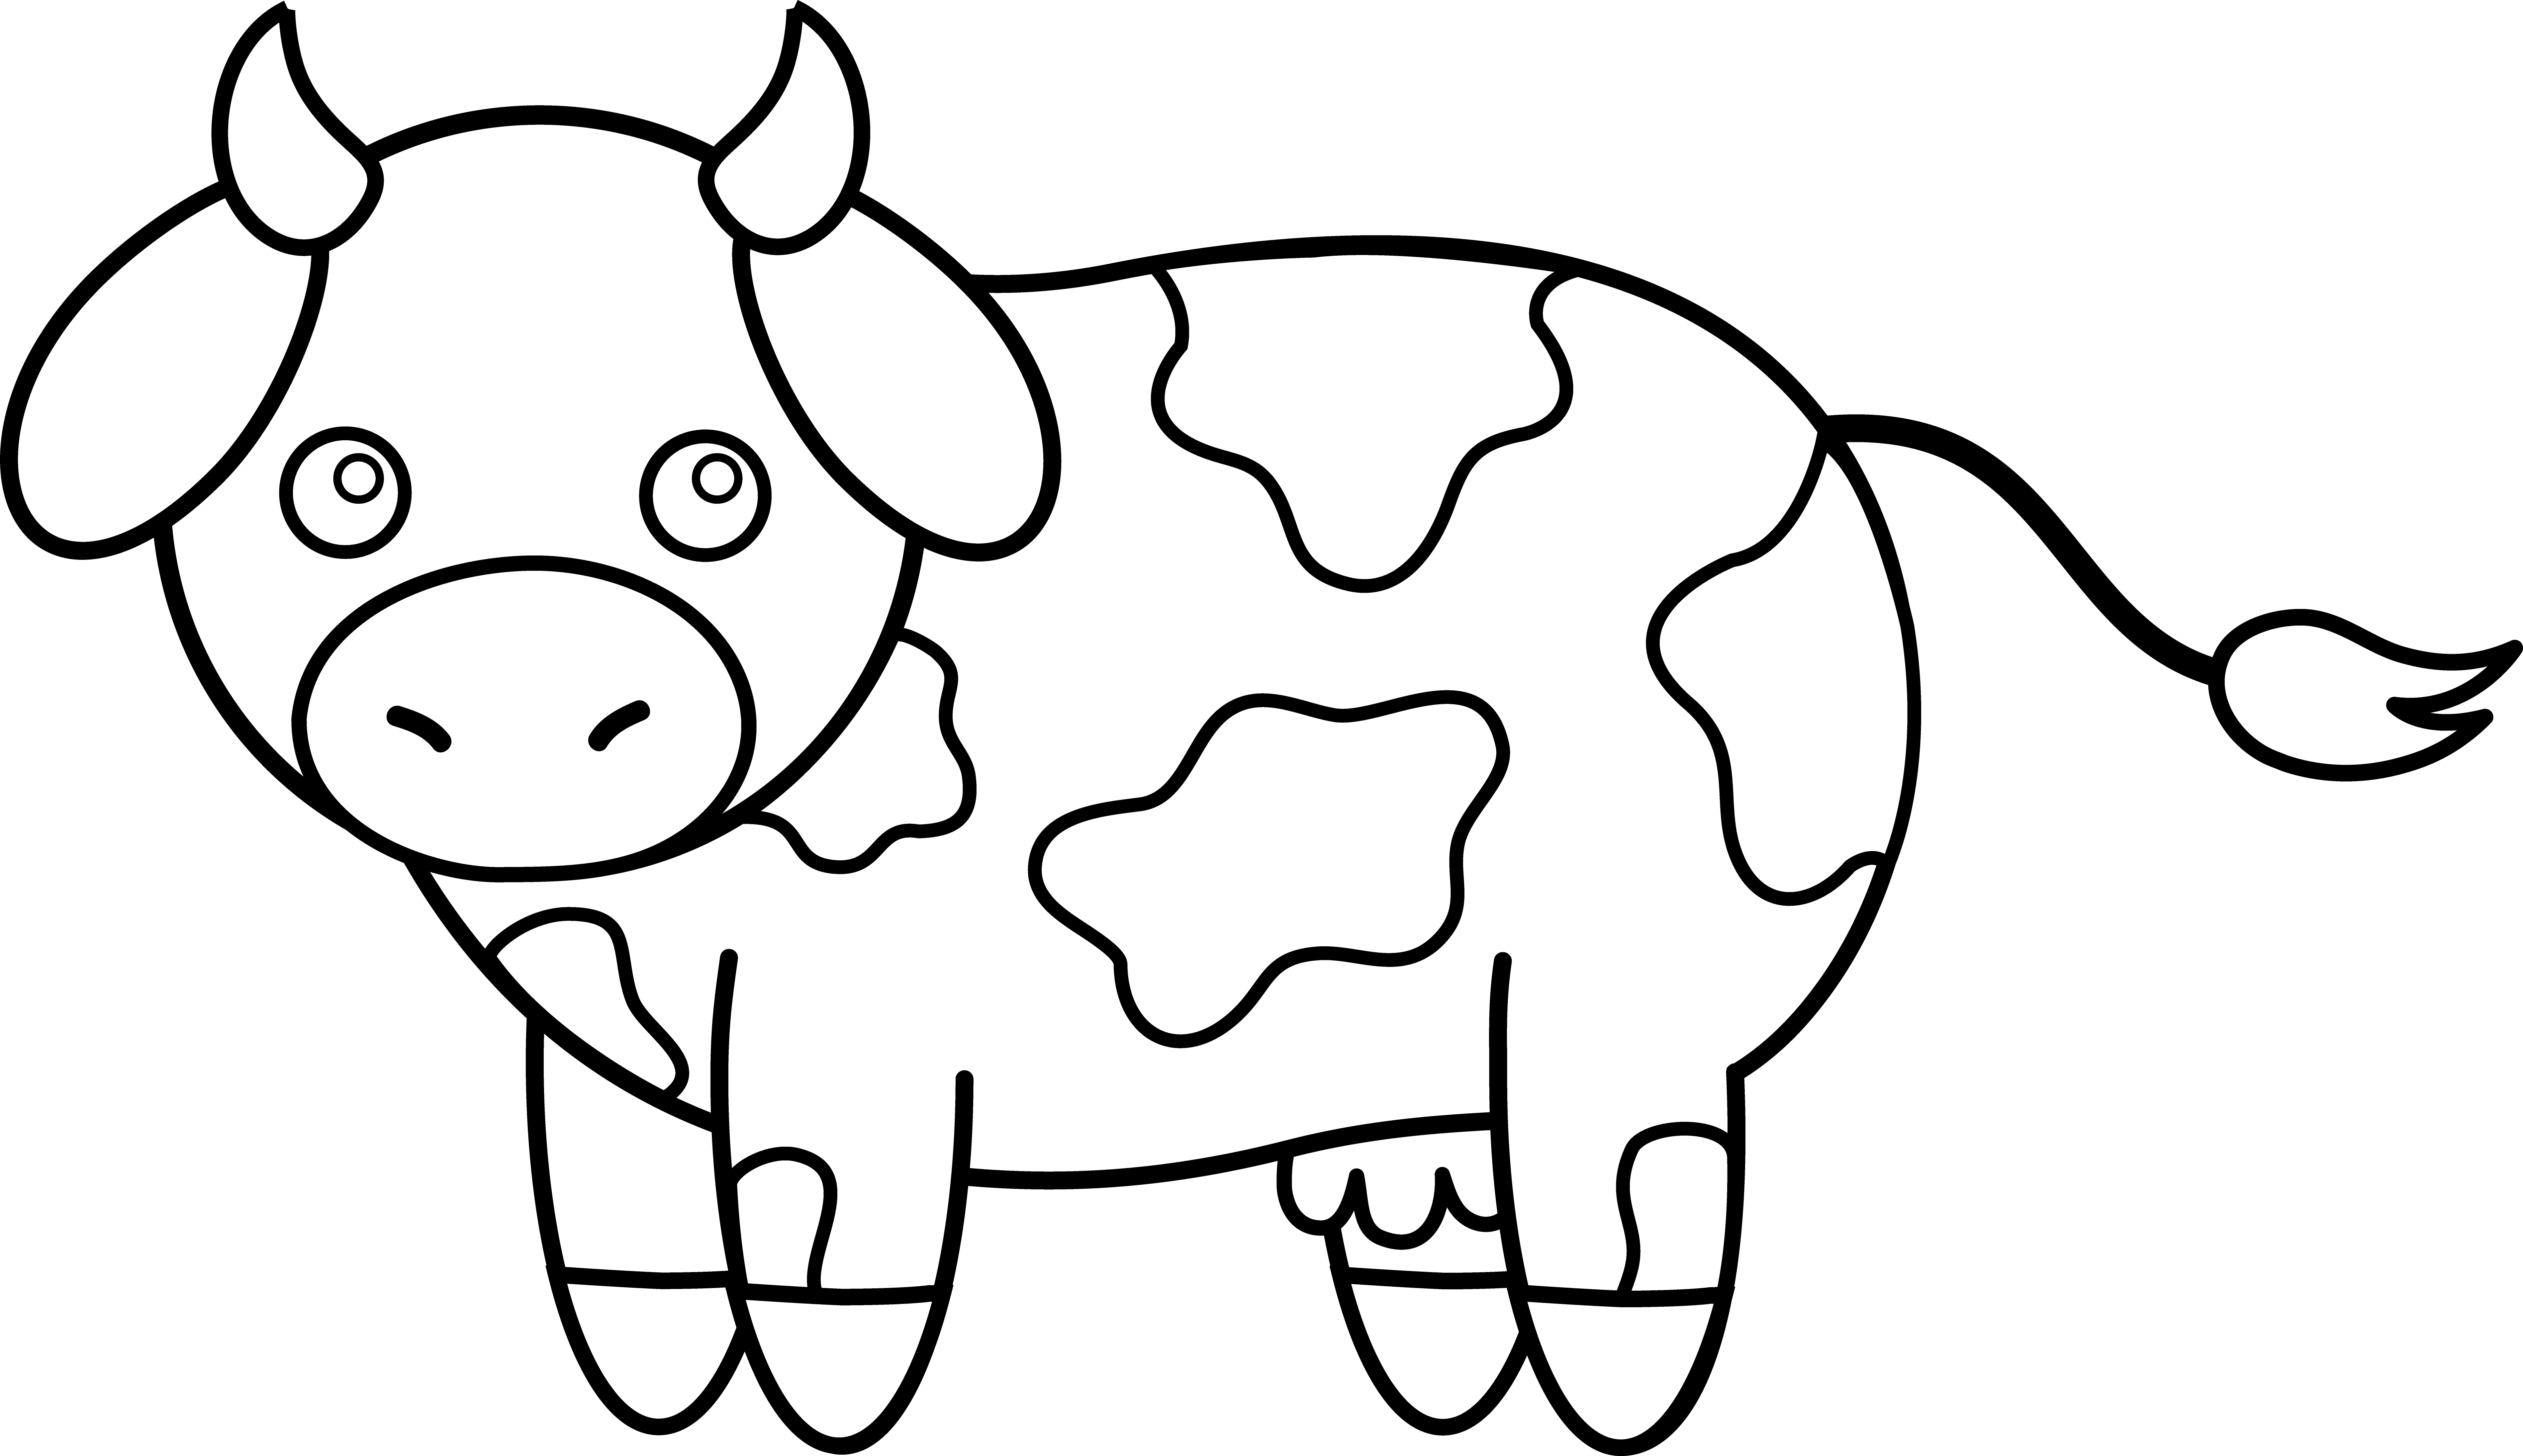 Farm clipart preschool. Cow line drawing clip